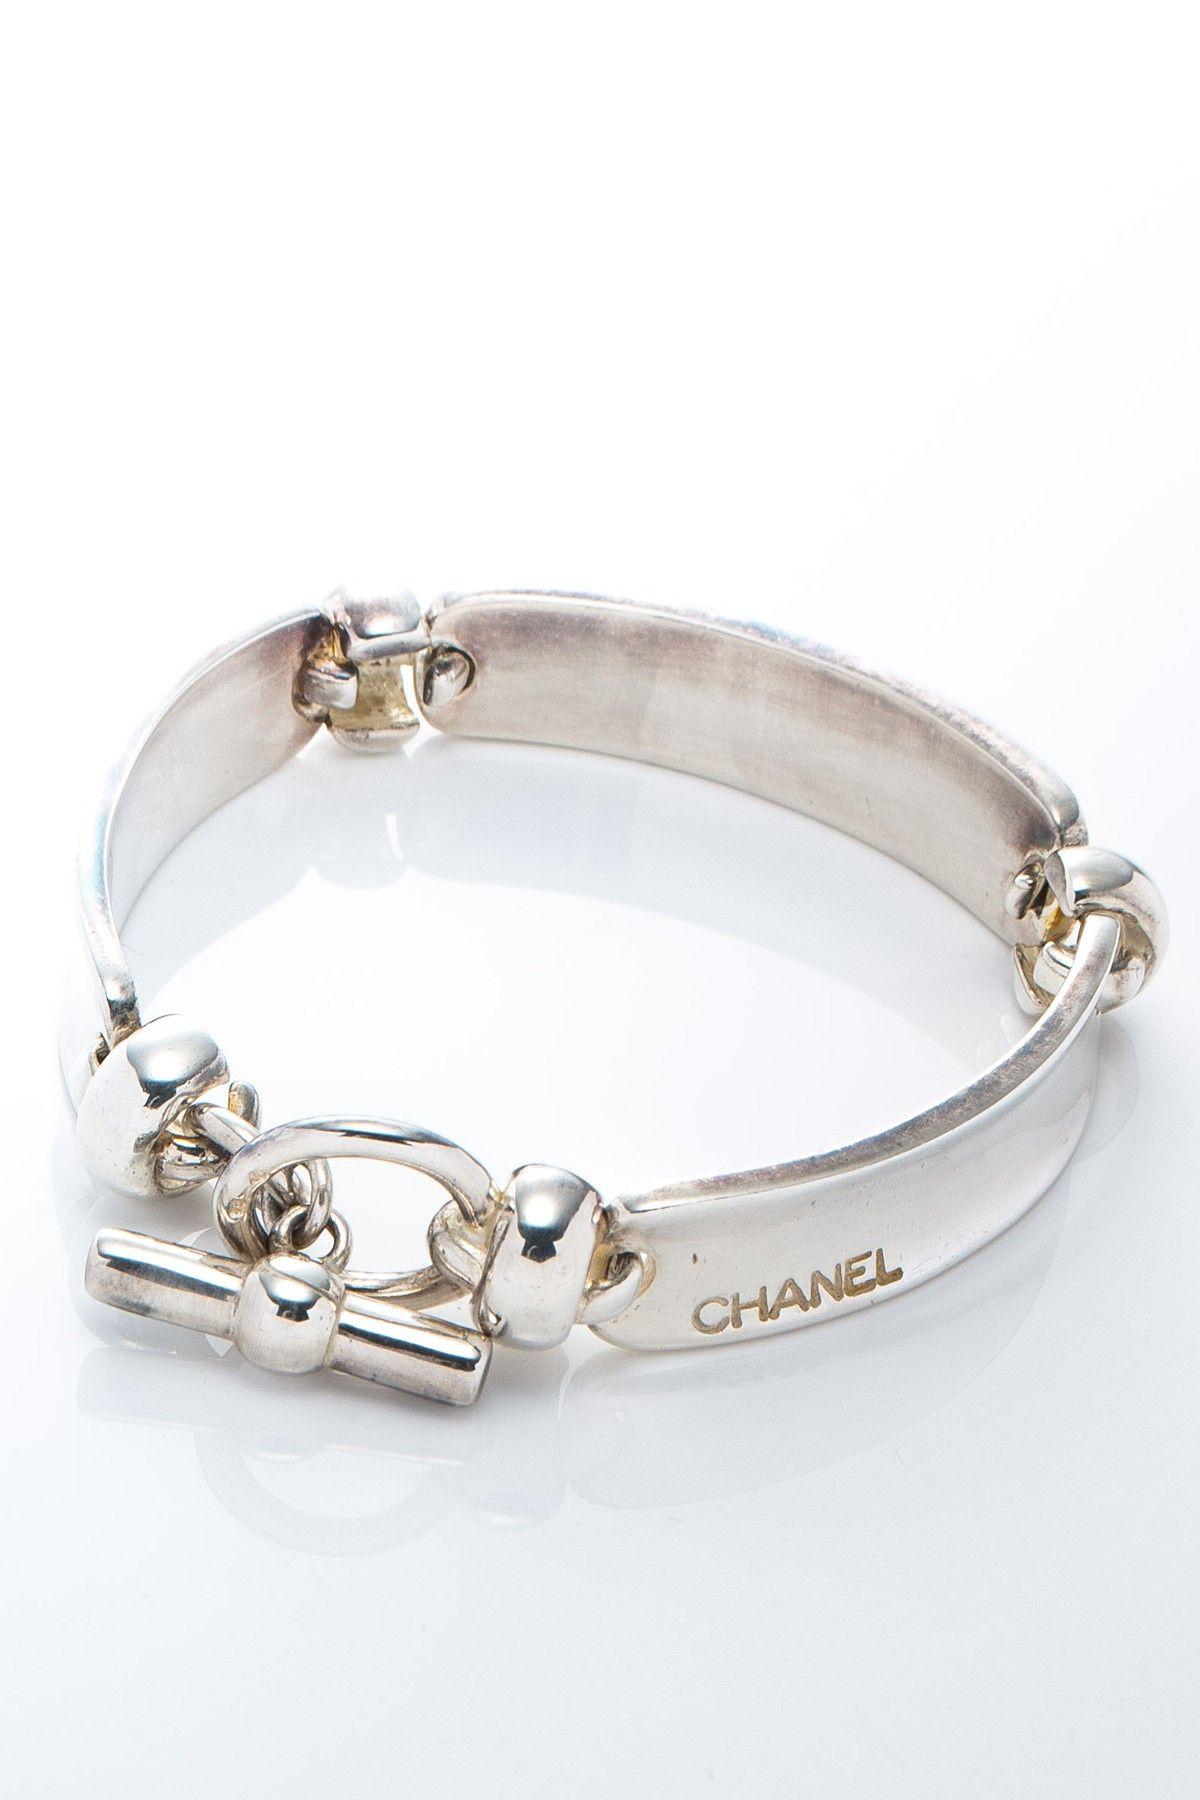 57f5f9faed5d Vintage Chanel Silver 925 Bracelet